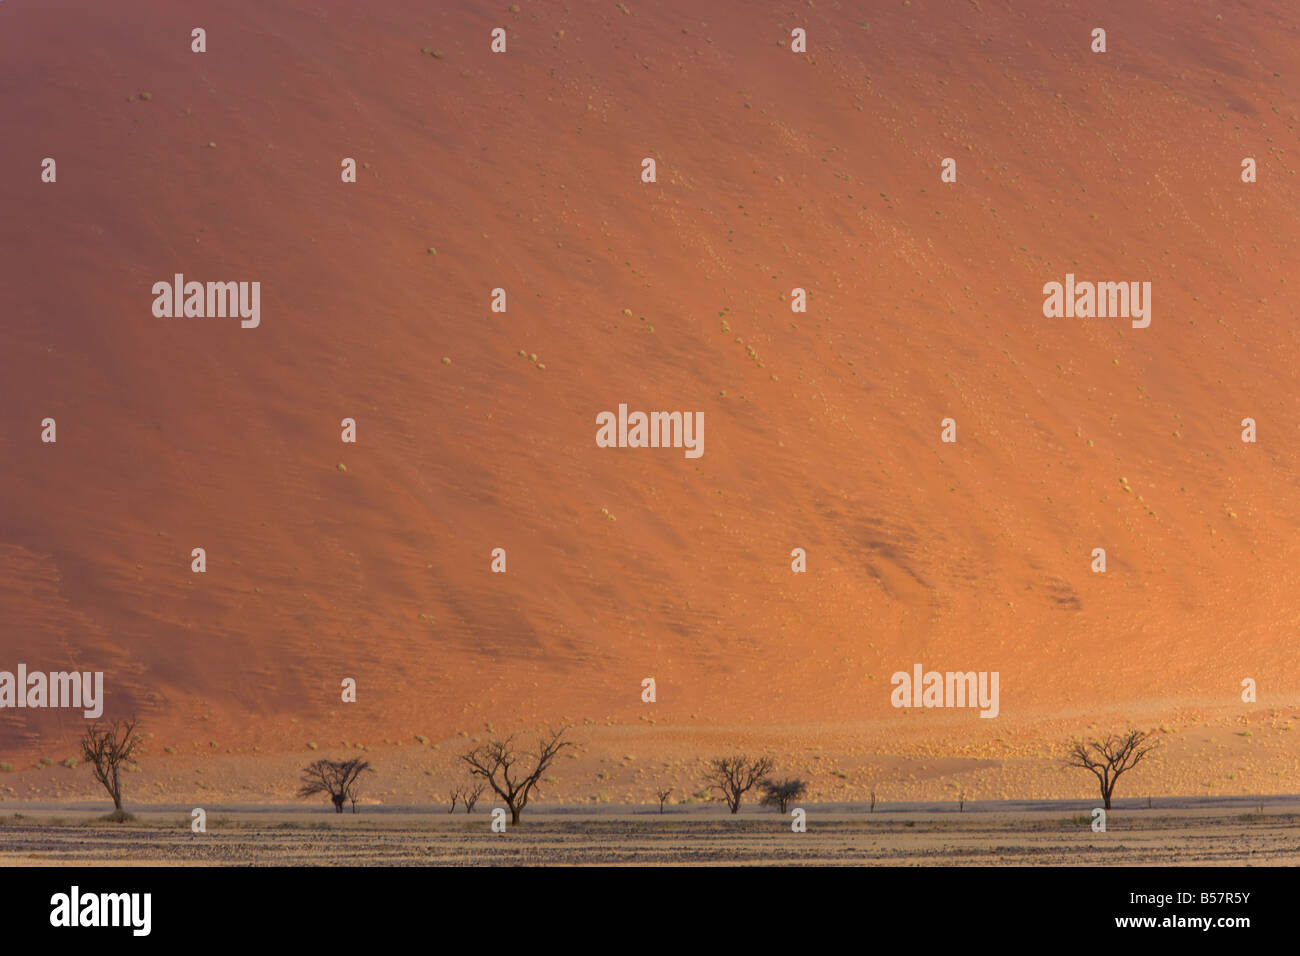 Dunes de sable, Sossusvlei, Namib Naukluft Park, Désert du Namib, Namibie, Afrique Photo Stock